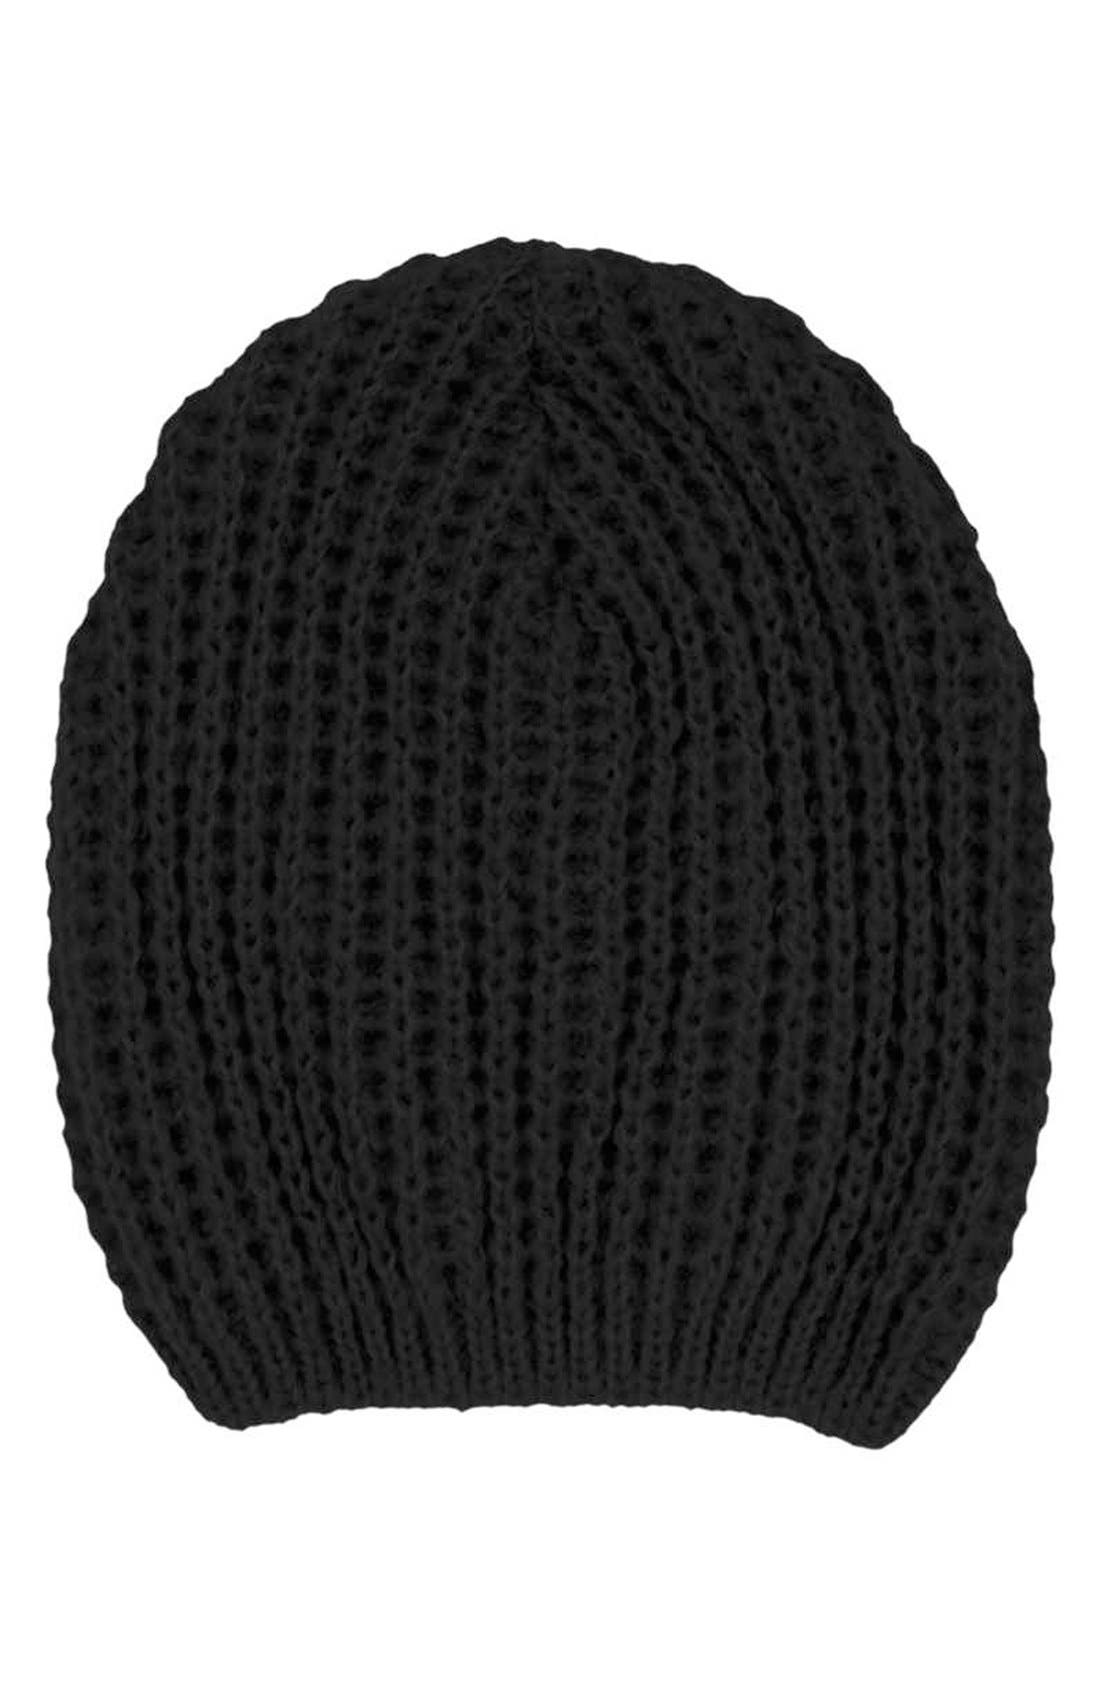 Alternate Image 2  - Topshop 'Cobweb' Knit Beanie